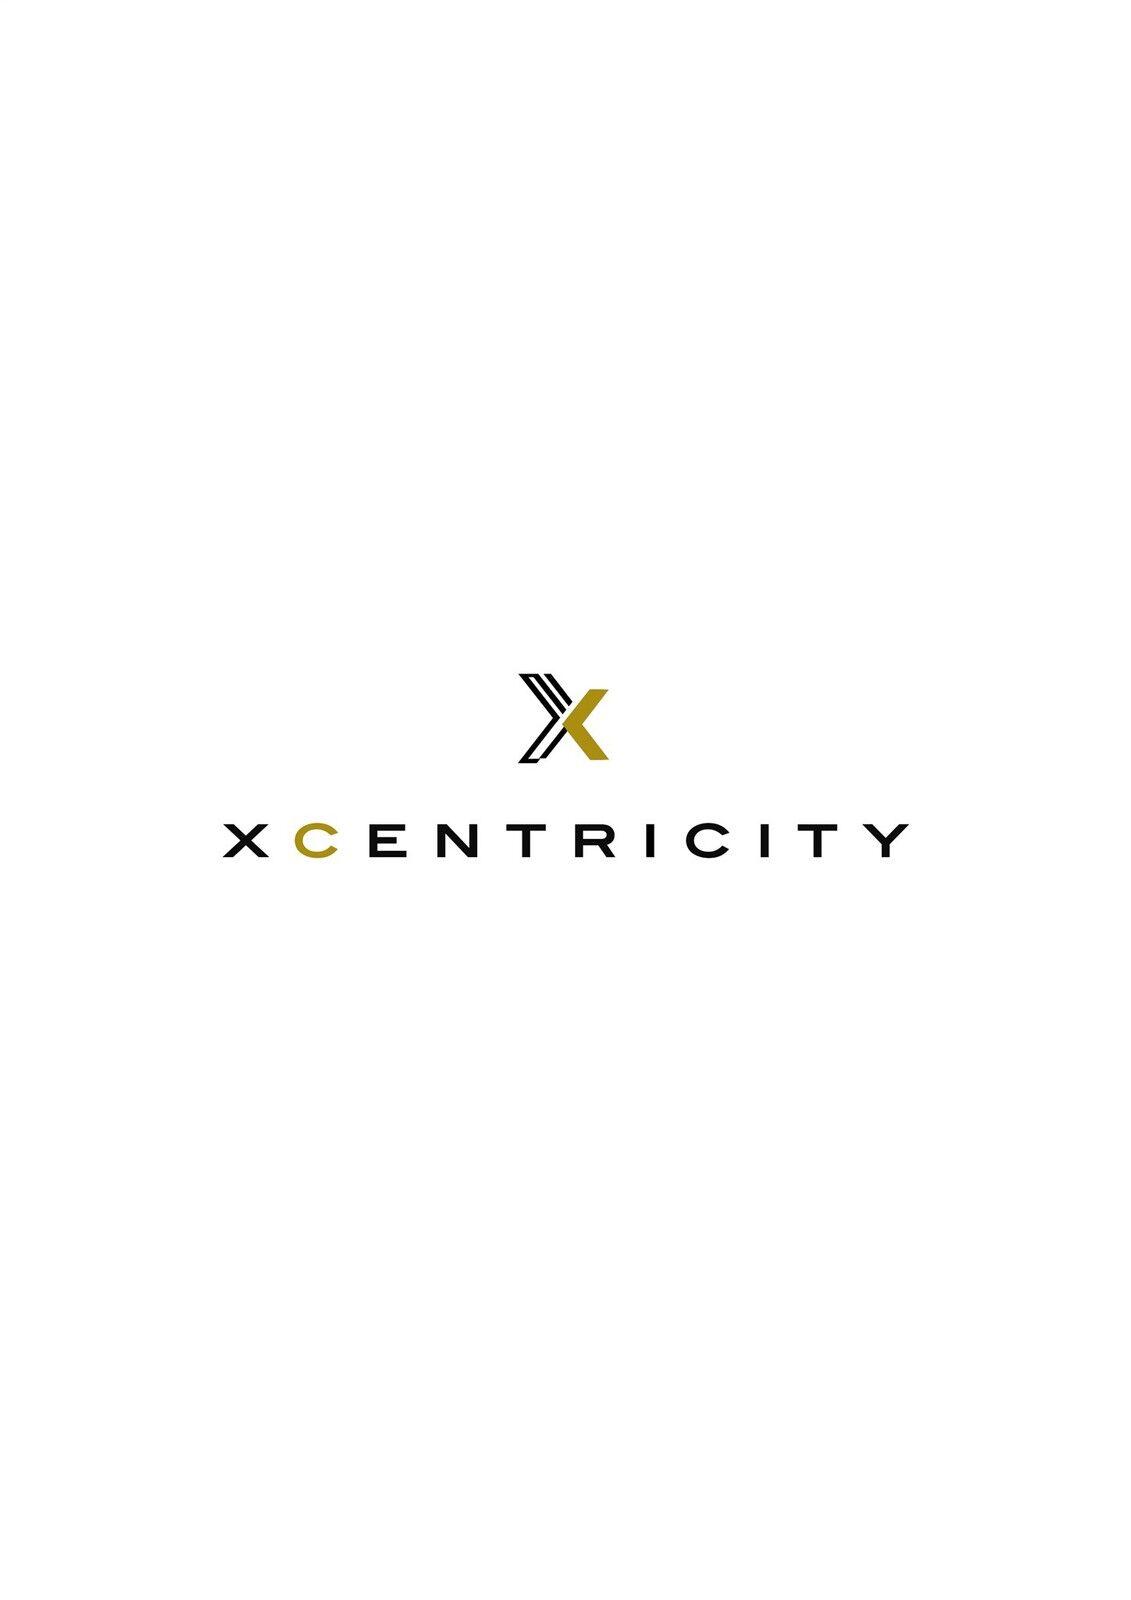 XCENTRiCiTY